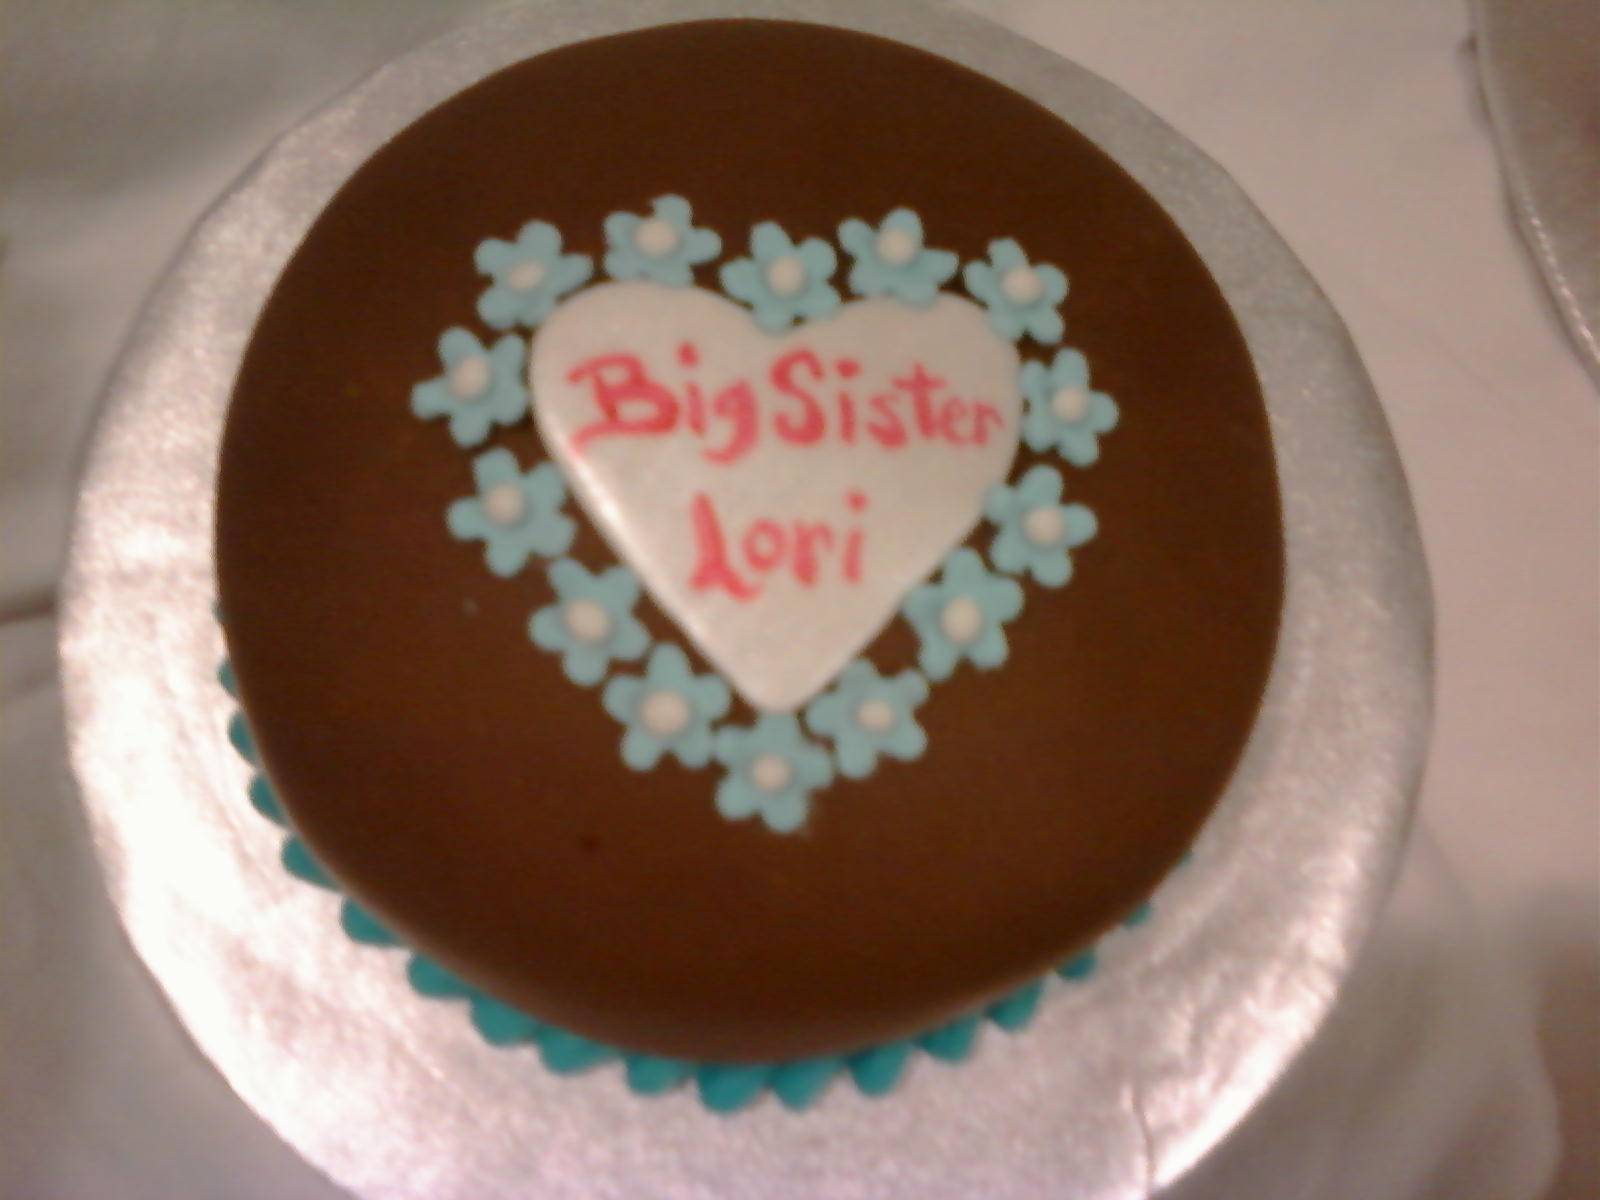 big sister cake